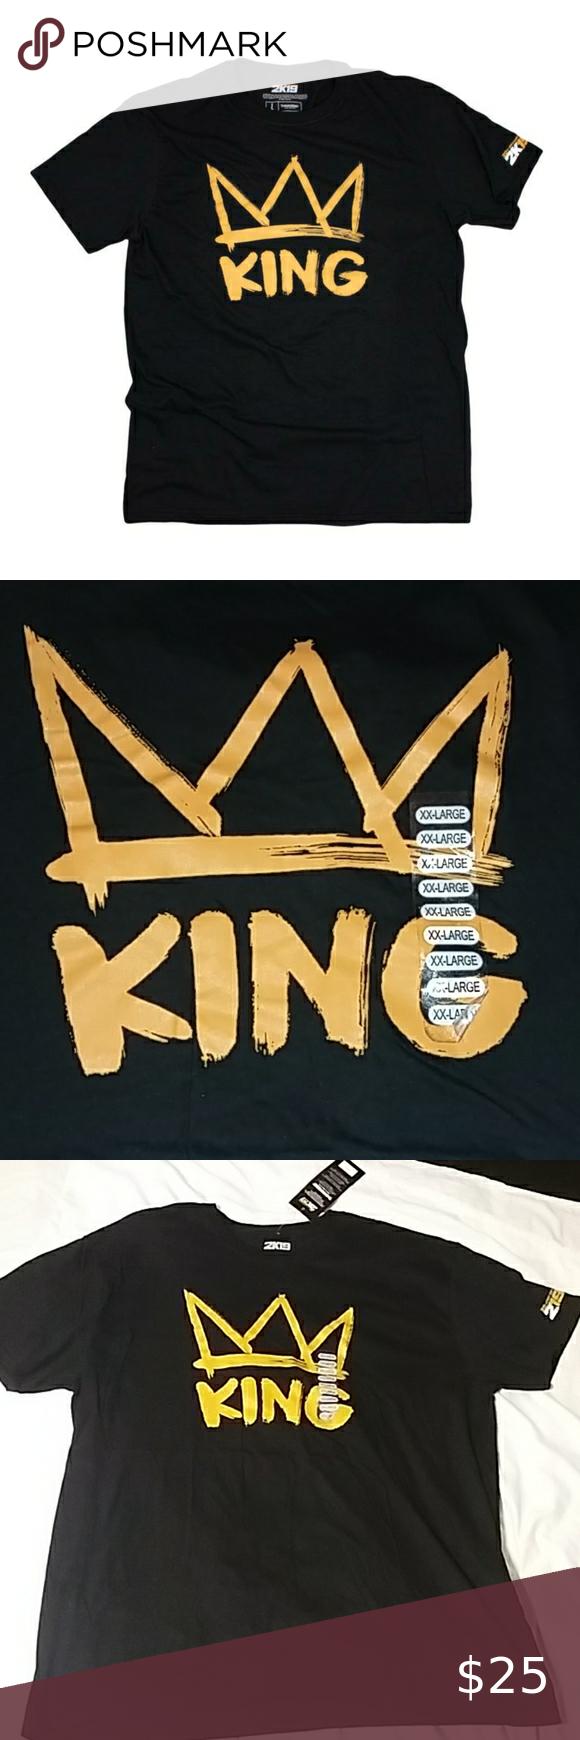 Nba 2k19 Crown King T Shirt Geek Shirts King Tshirt Shirts